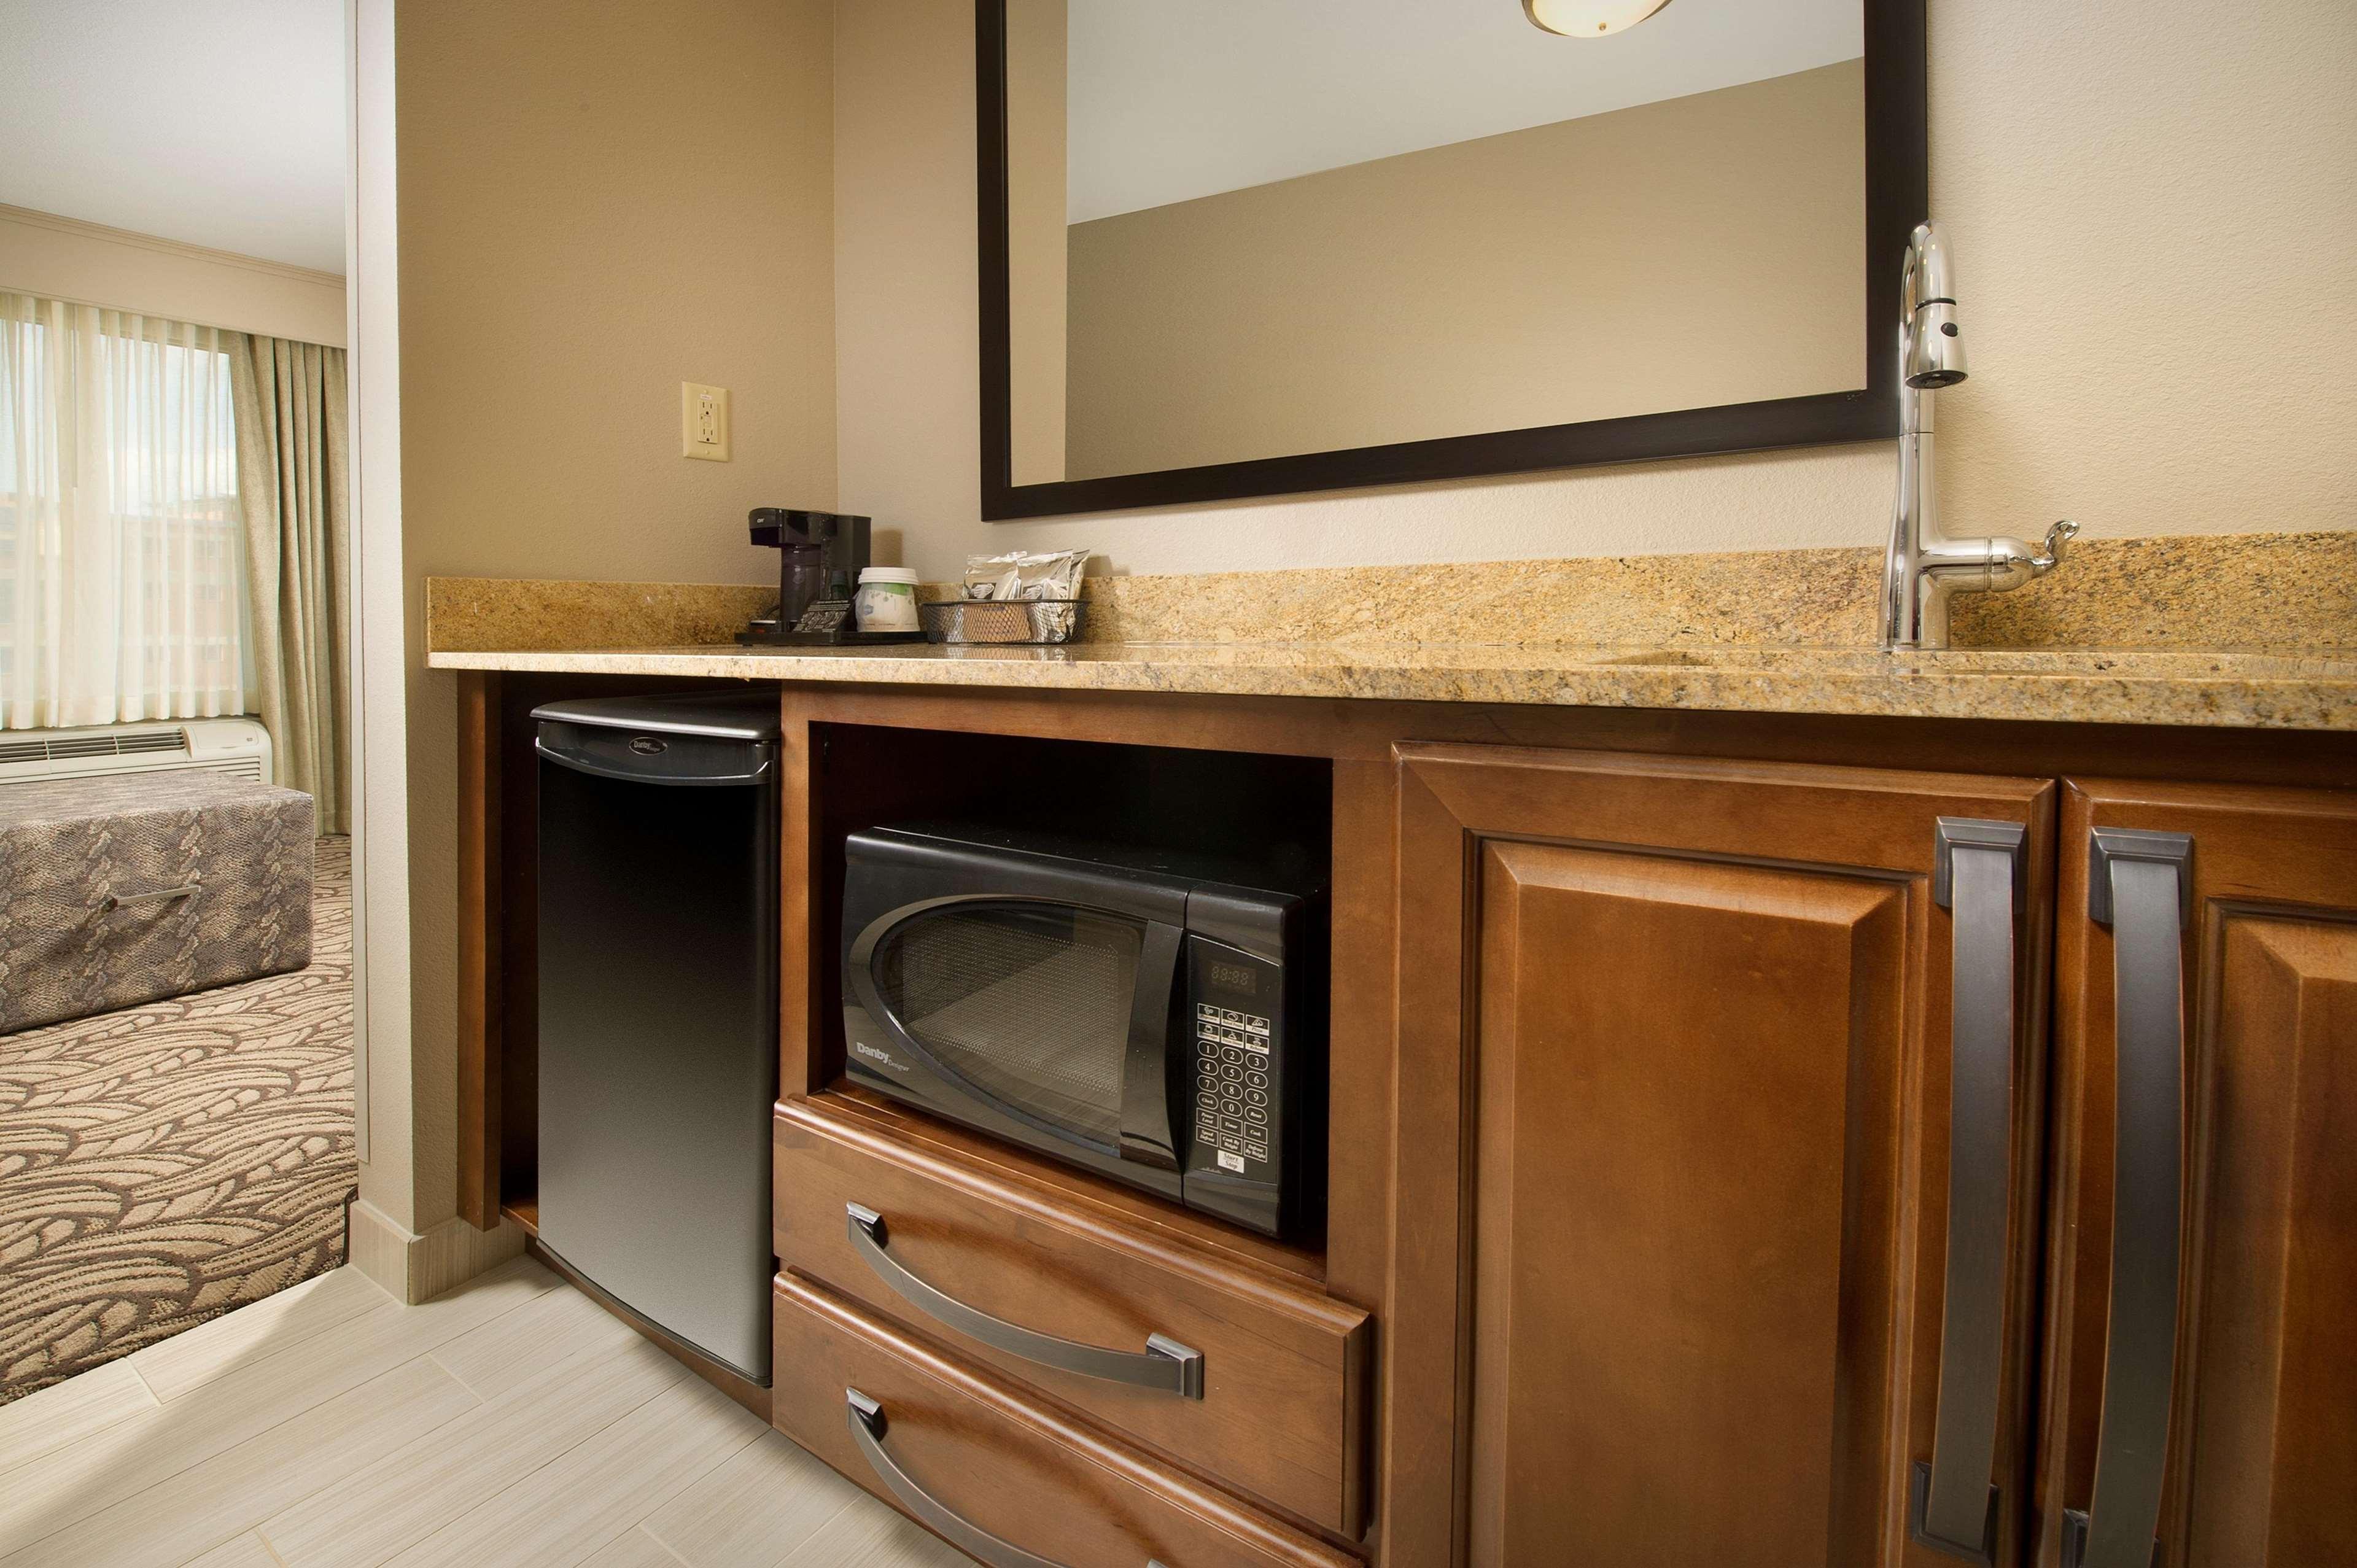 Hampton Inn & Suites San Antonio-Downtown/Market Square image 18